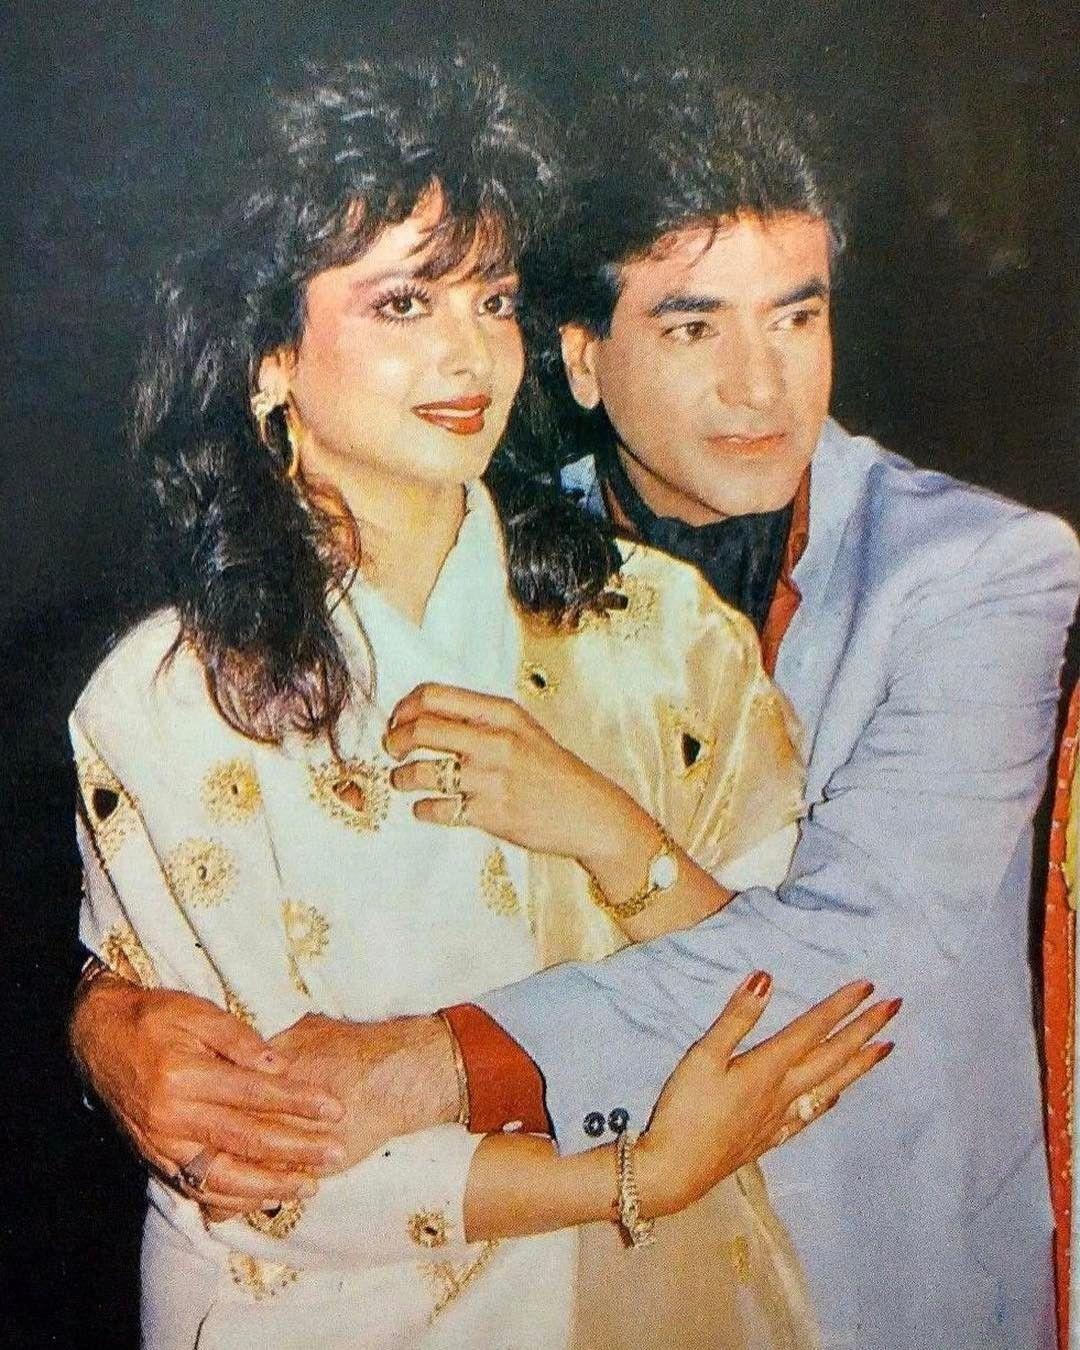 muvyz053017 #BollywoodFlashback #couplegoals #Jeetendra #Rekha 😍#muvyz  #instapic #instadaily #instagood | Bollywood pictures, Vintage bollywood,  Hot hero